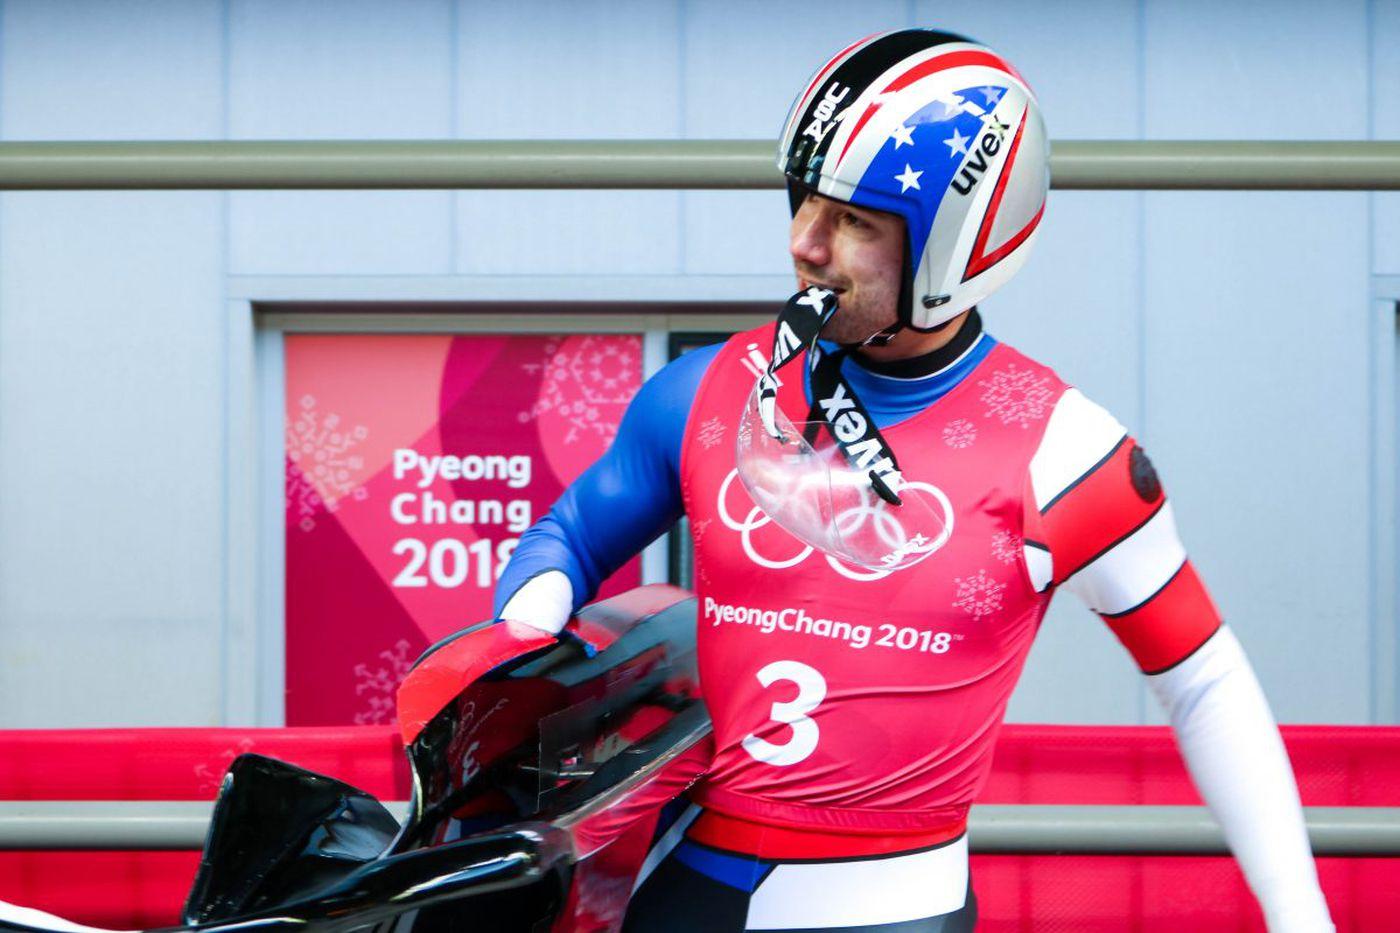 Pennsylvanians Andrew Sherk, Jayson Terdiman seek Olympic luge glory